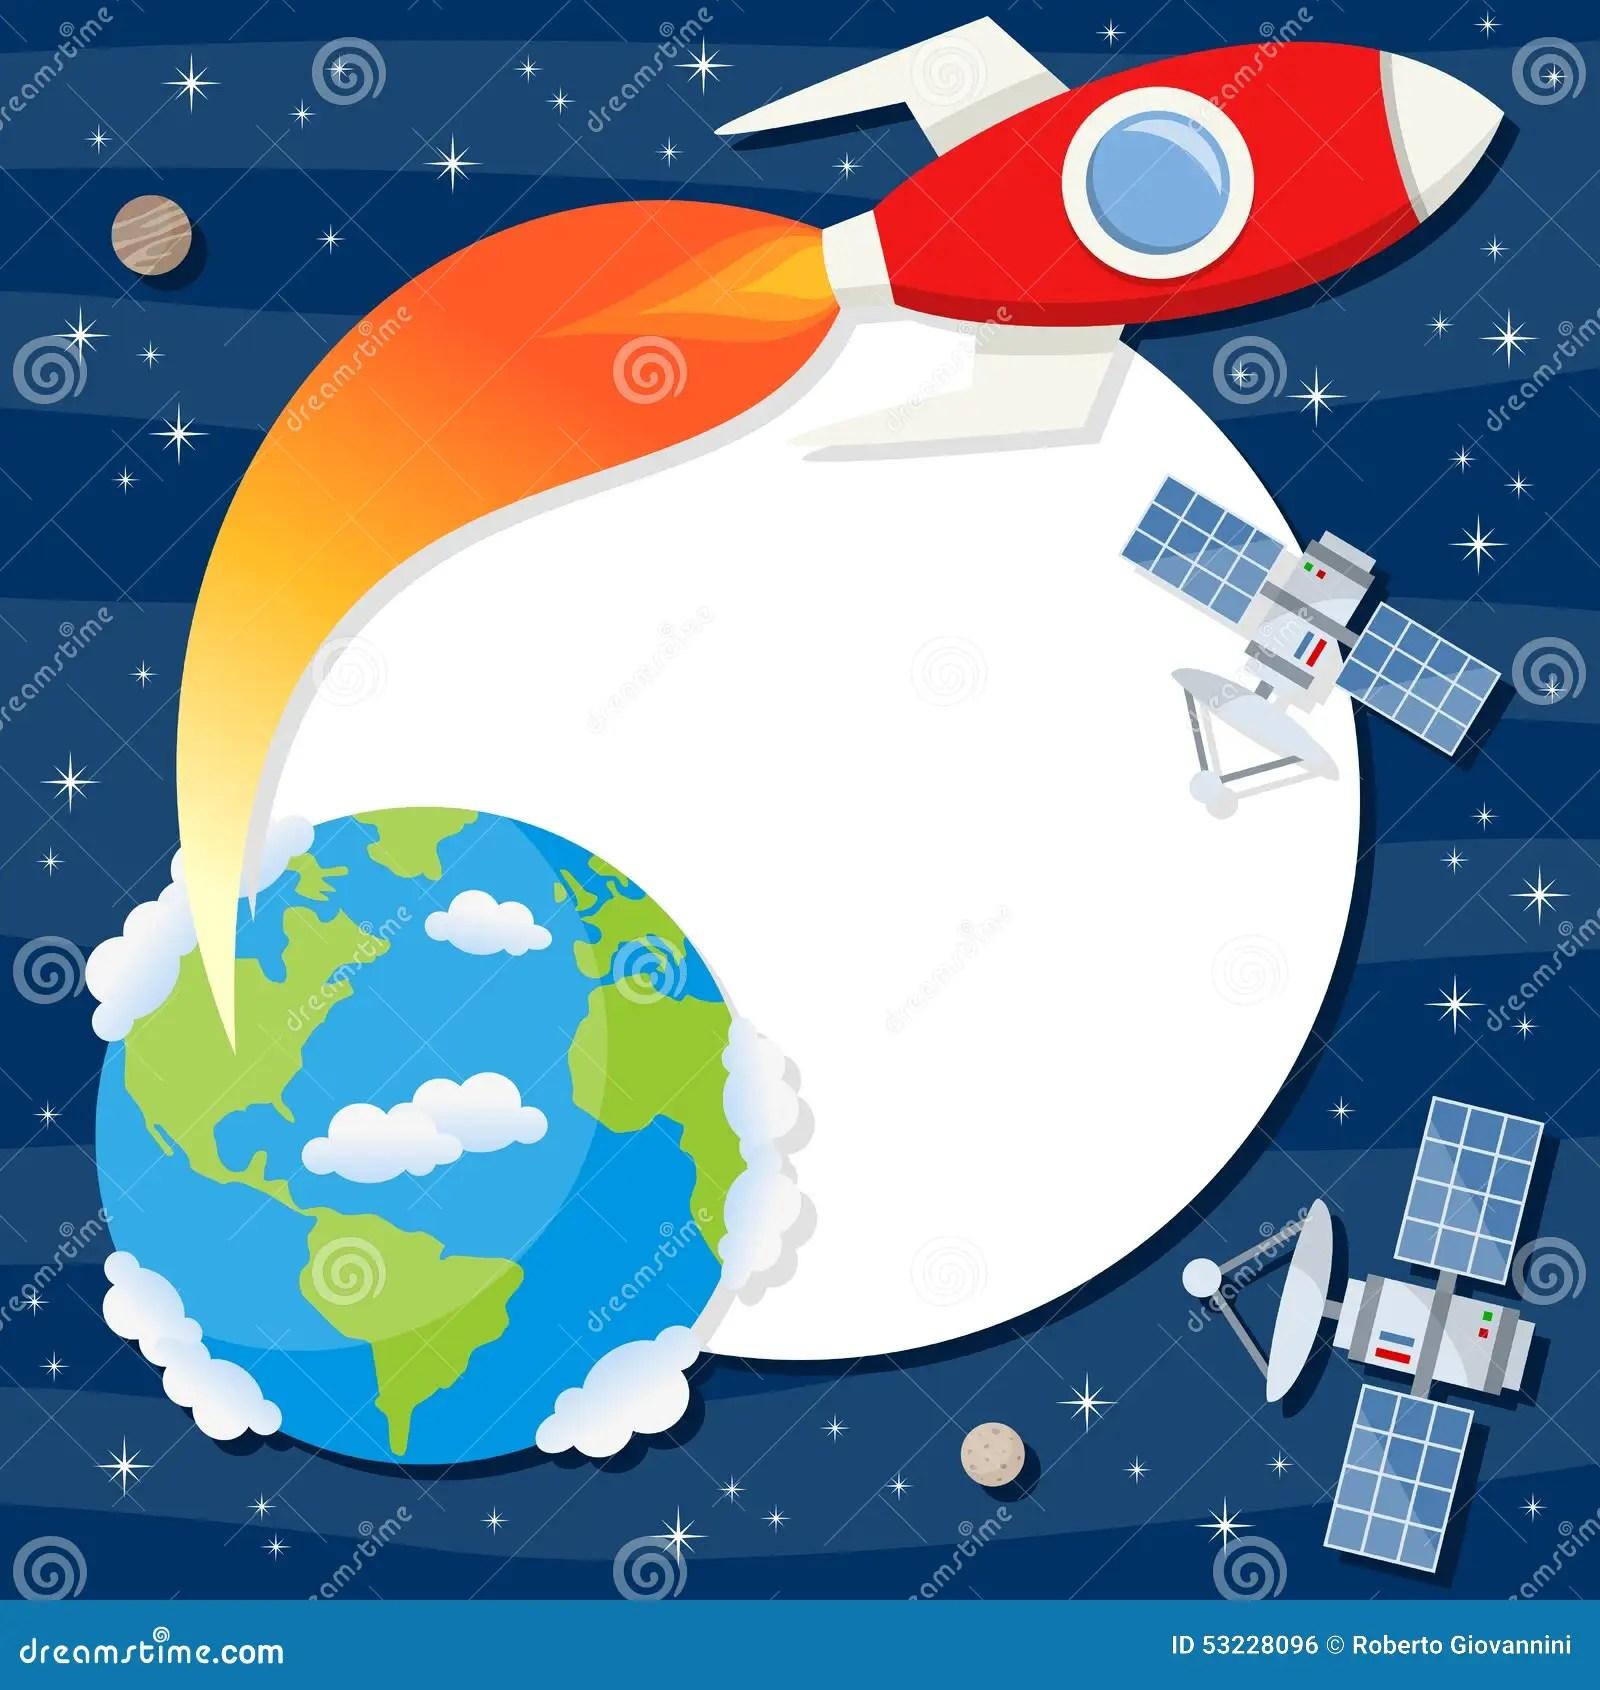 Rocket Earth Satellites Photo Frame Stock Vector